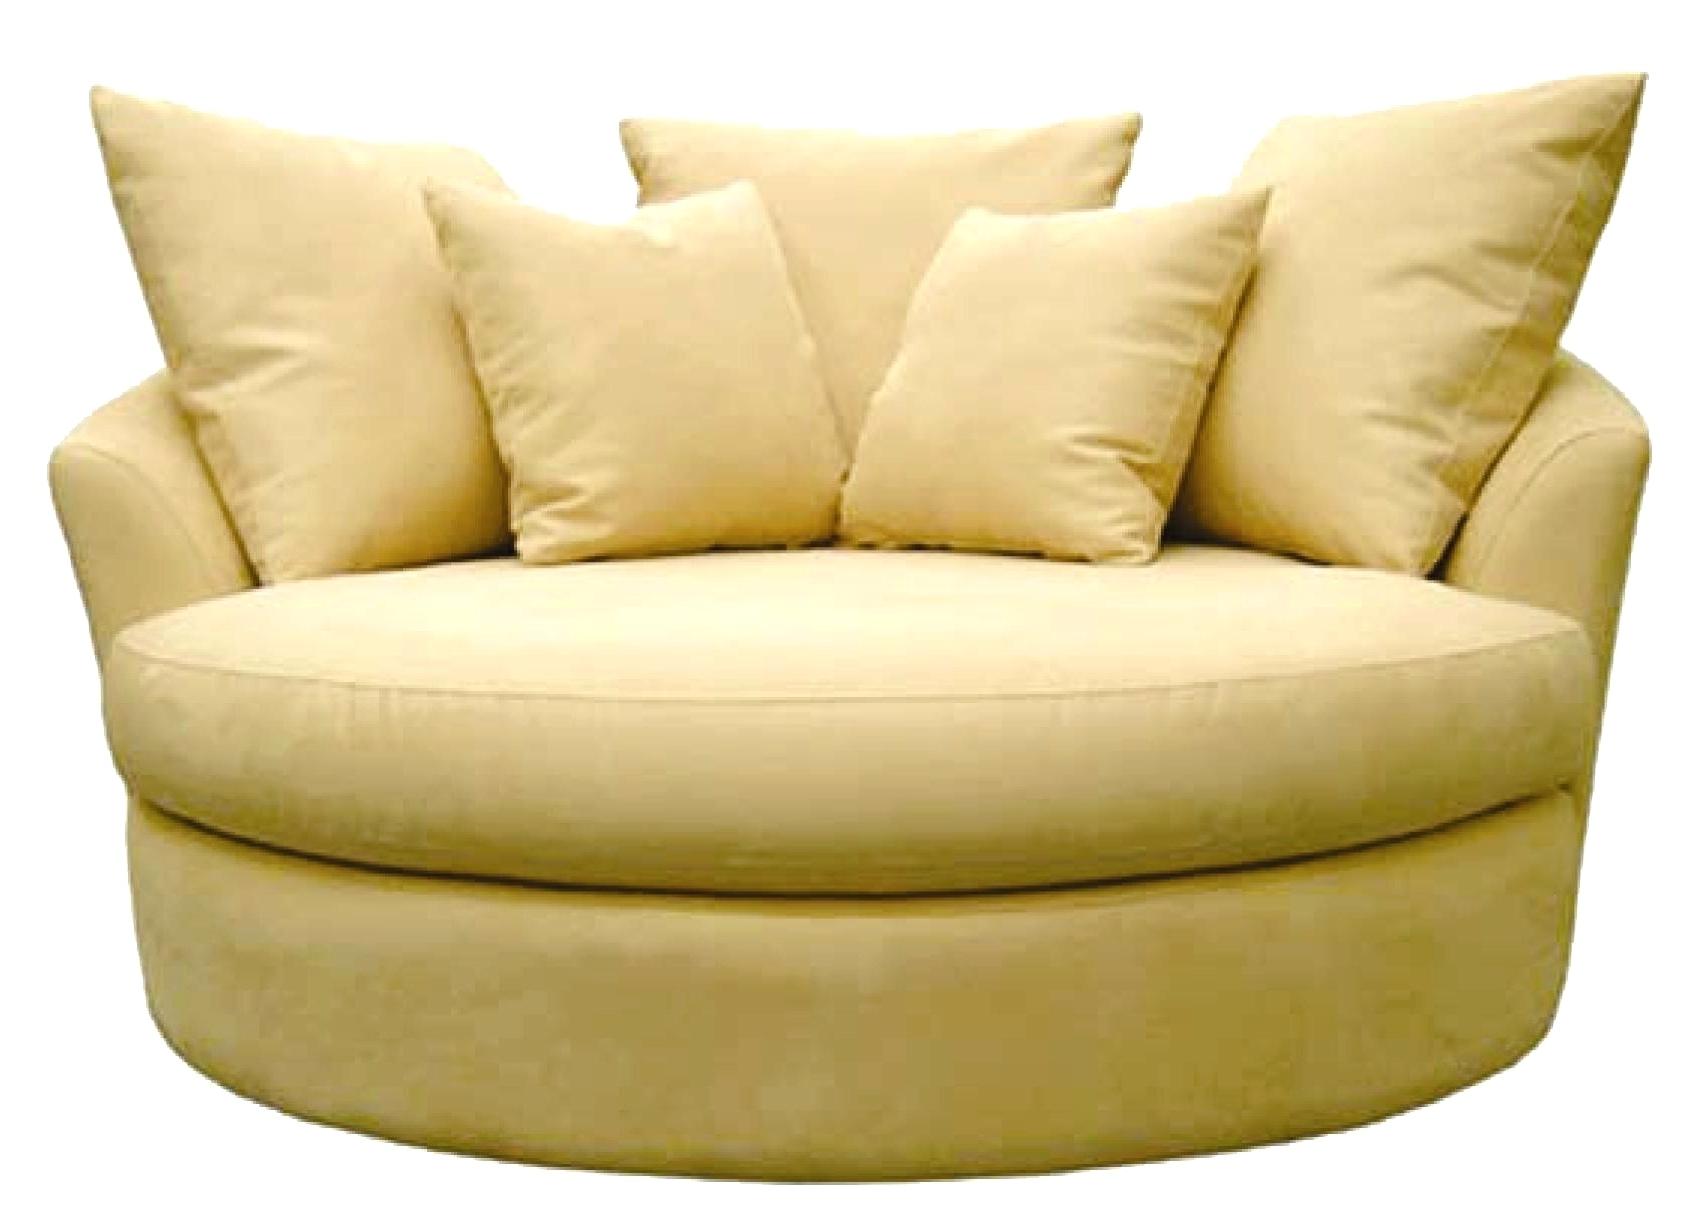 Big Round Sofa Chairs With 2019 Sofa : Round Sofa Chair Australia Round Sofa Chair Nz Big Round (View 7 of 20)